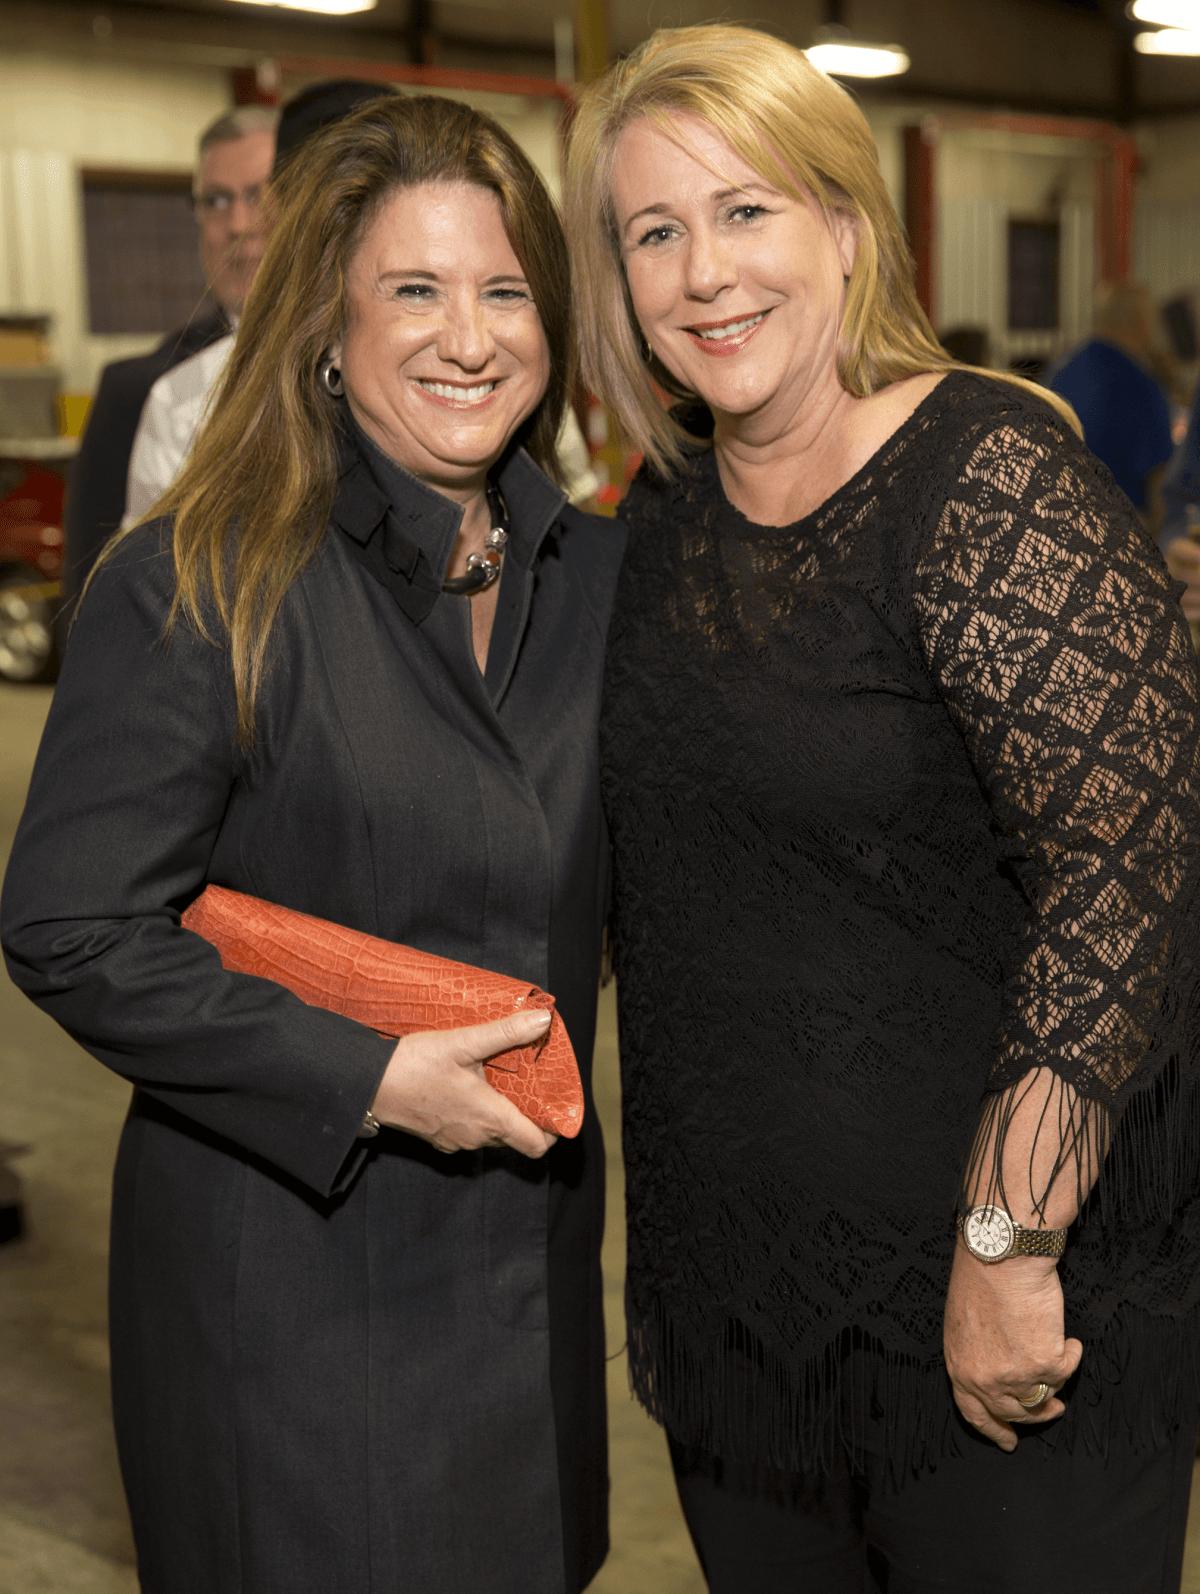 Houston, Art of Conversation kick off, Oct. 2016, Deborah Colton, Stacey Swift